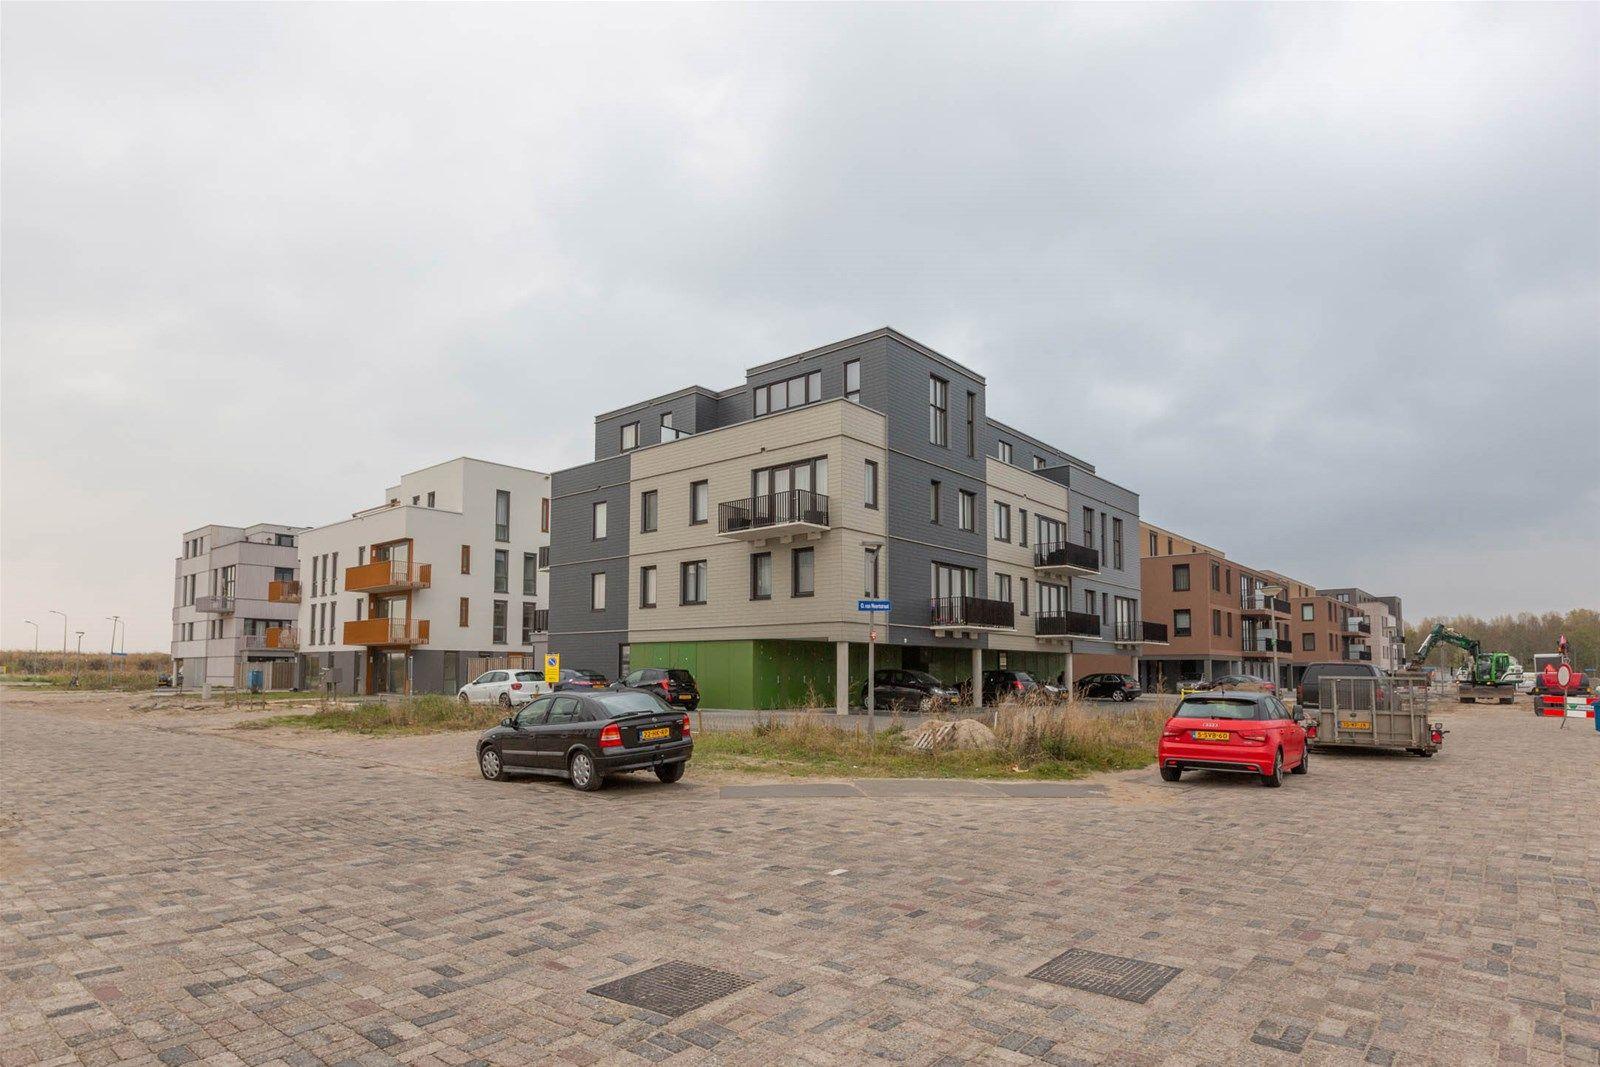 Olivier van Noortstraat 22p, Almere